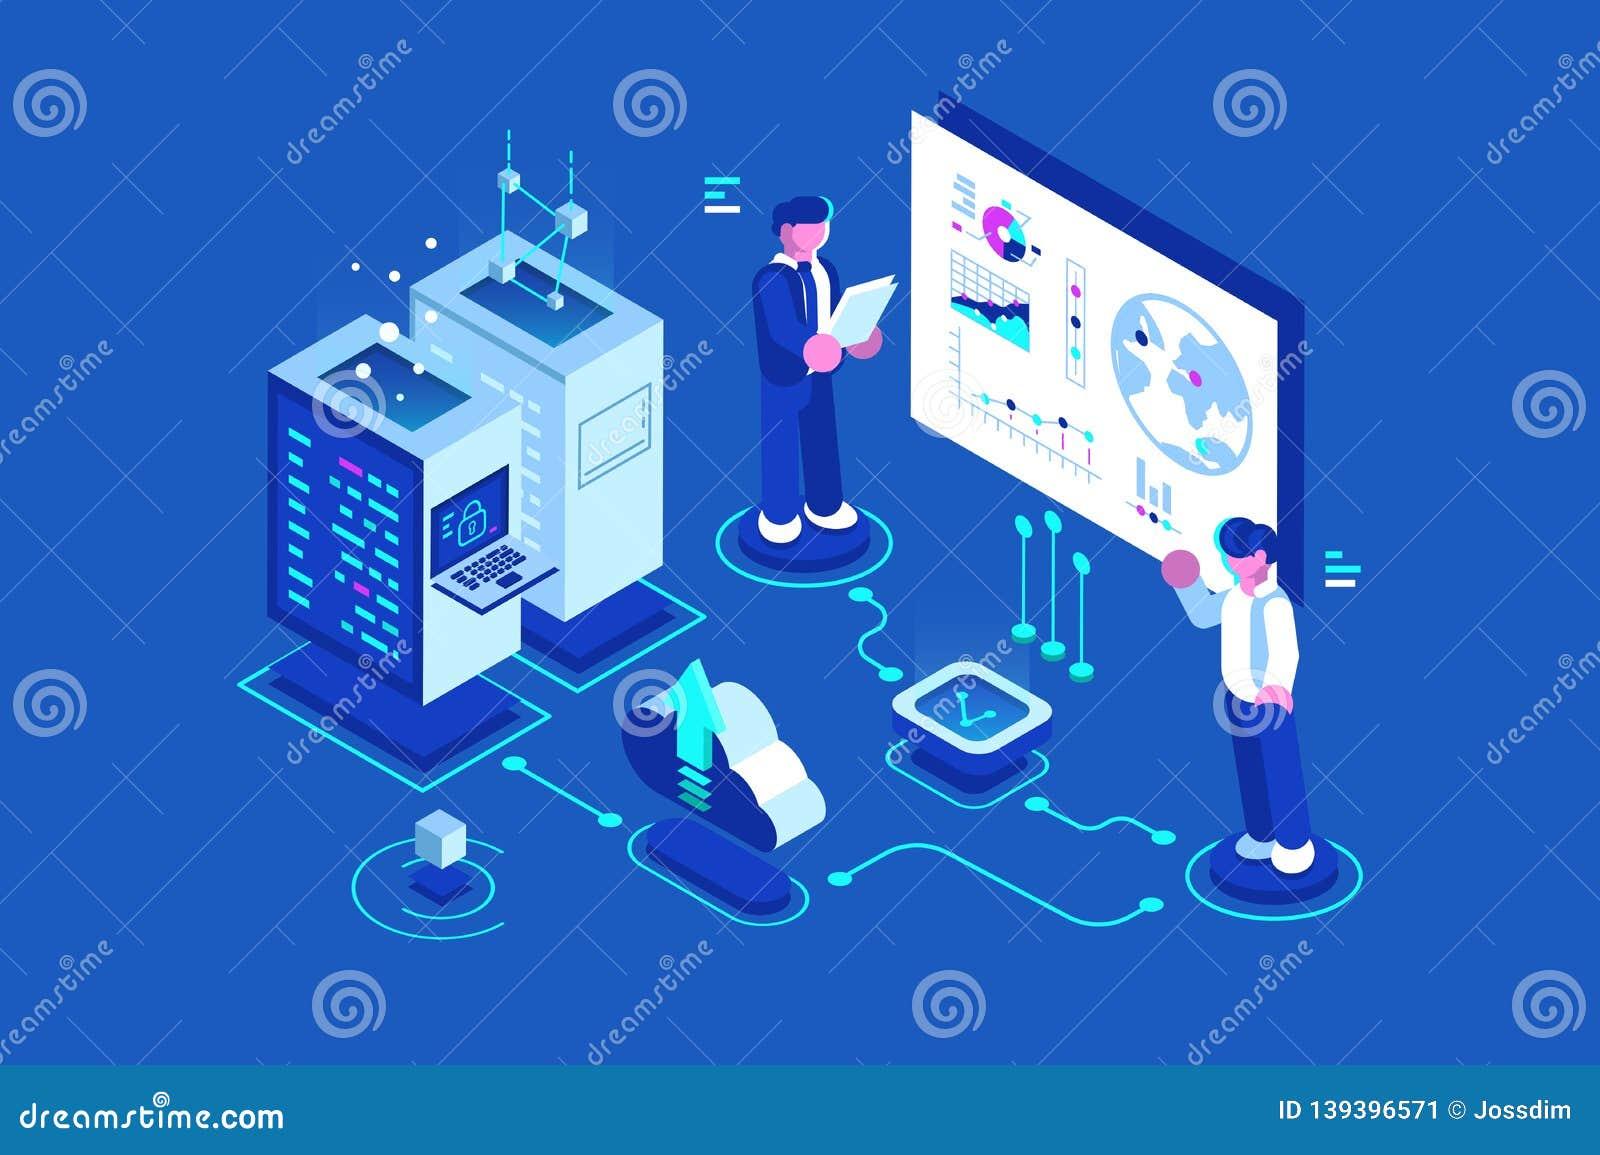 Internet Data Center Stock Vector Illustration Of Administration 139396571